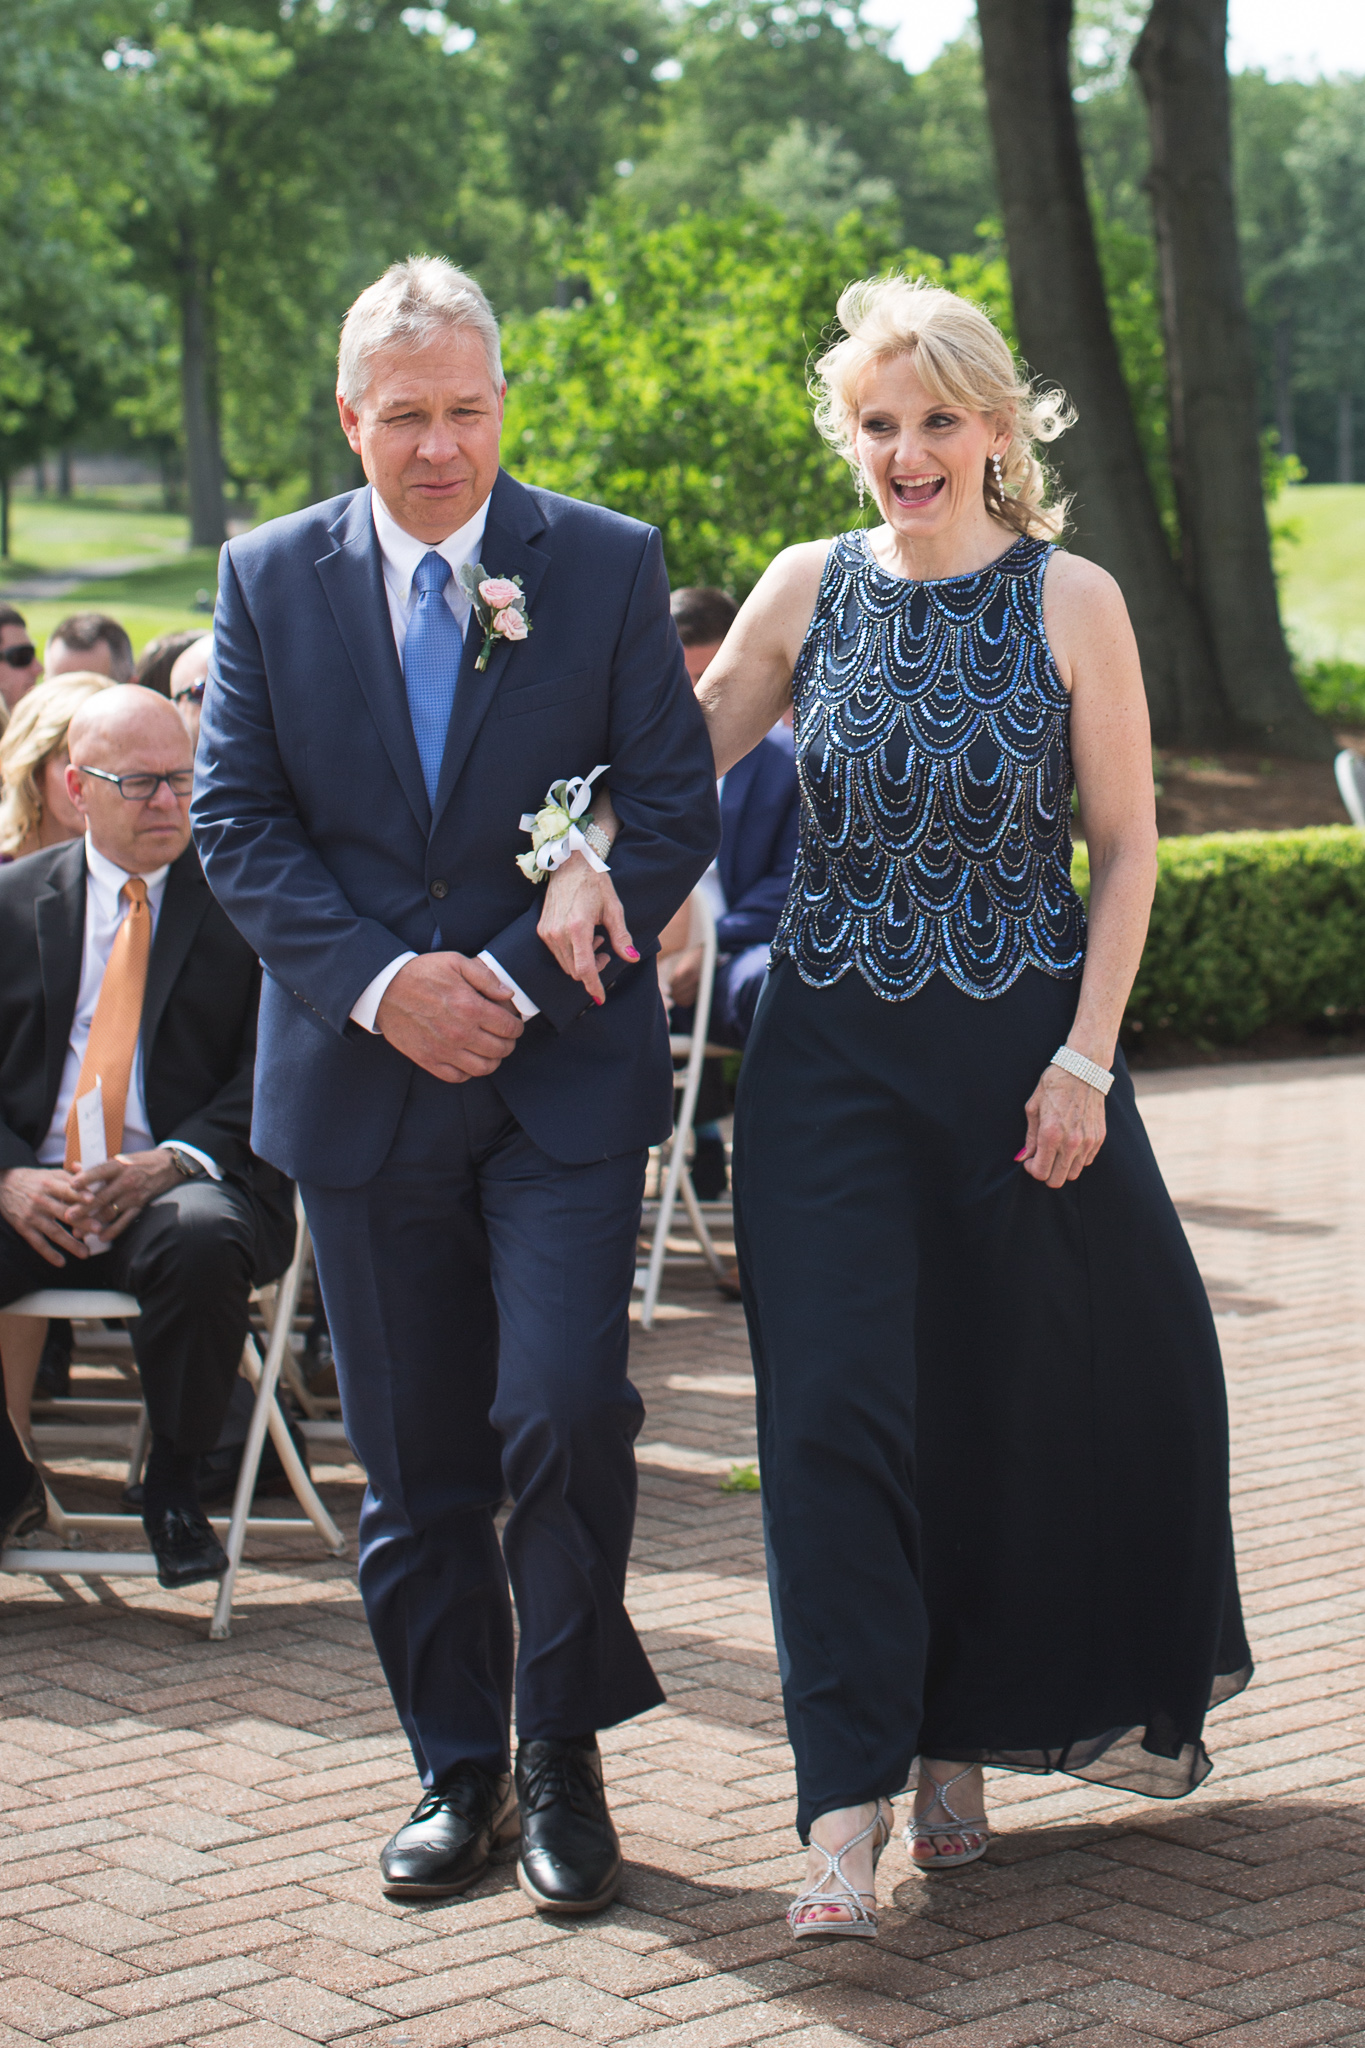 068-best-detroit-michigan-outdoor-wedding-photographer.jpg